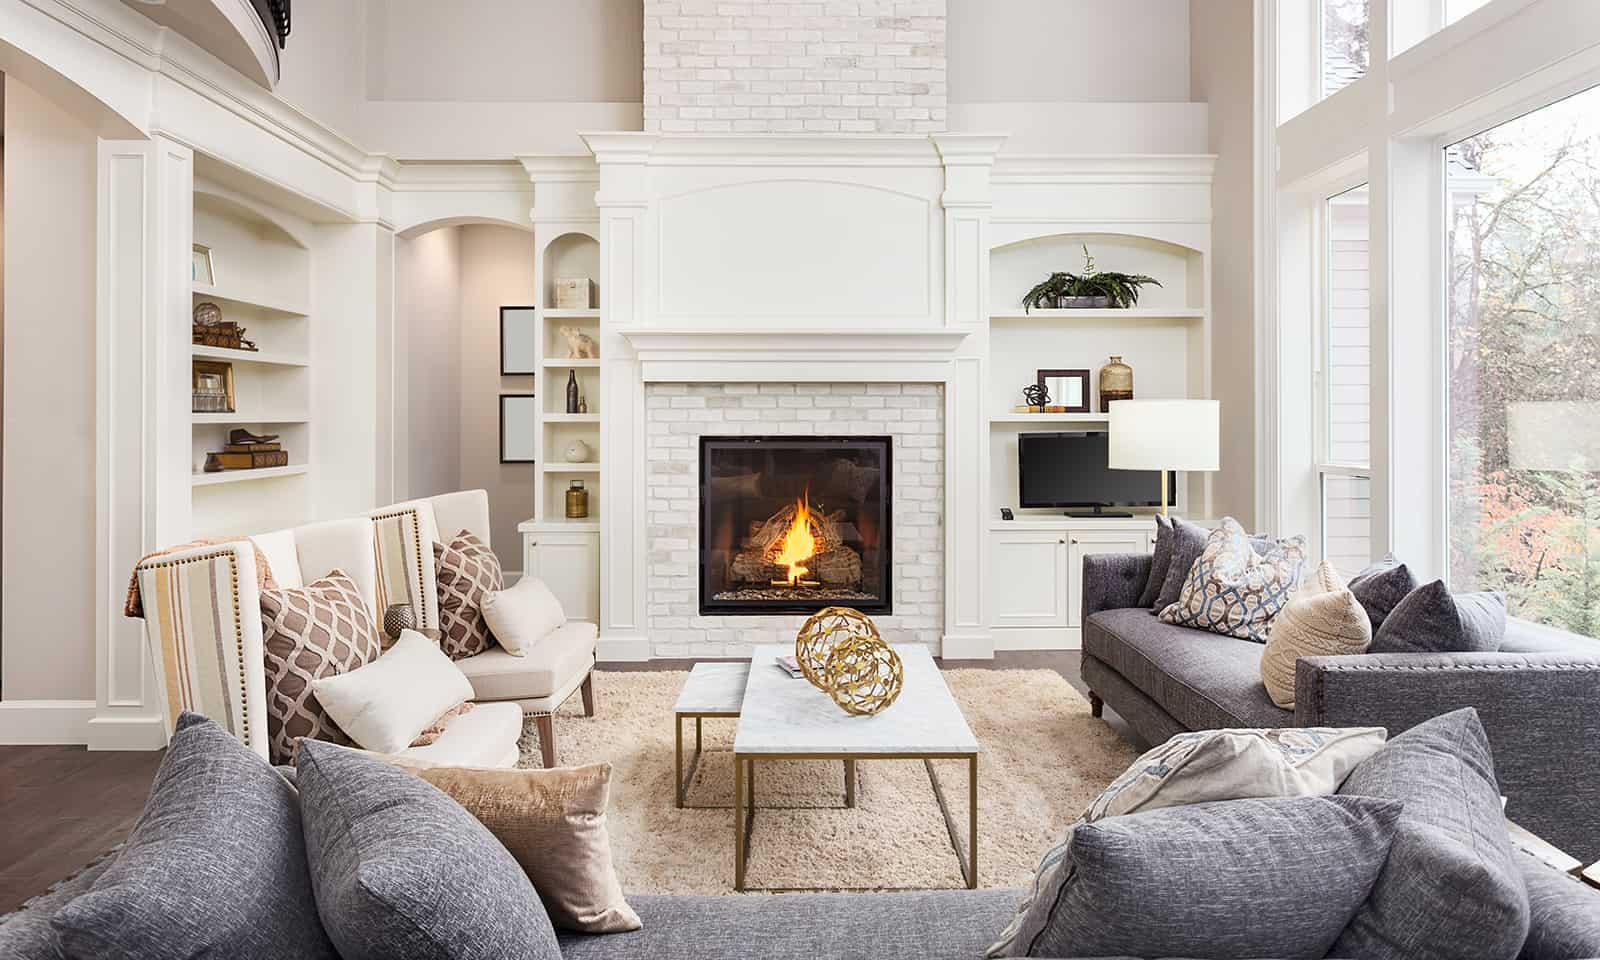 home-improvement-loans-main-image-viva-glam-magazine